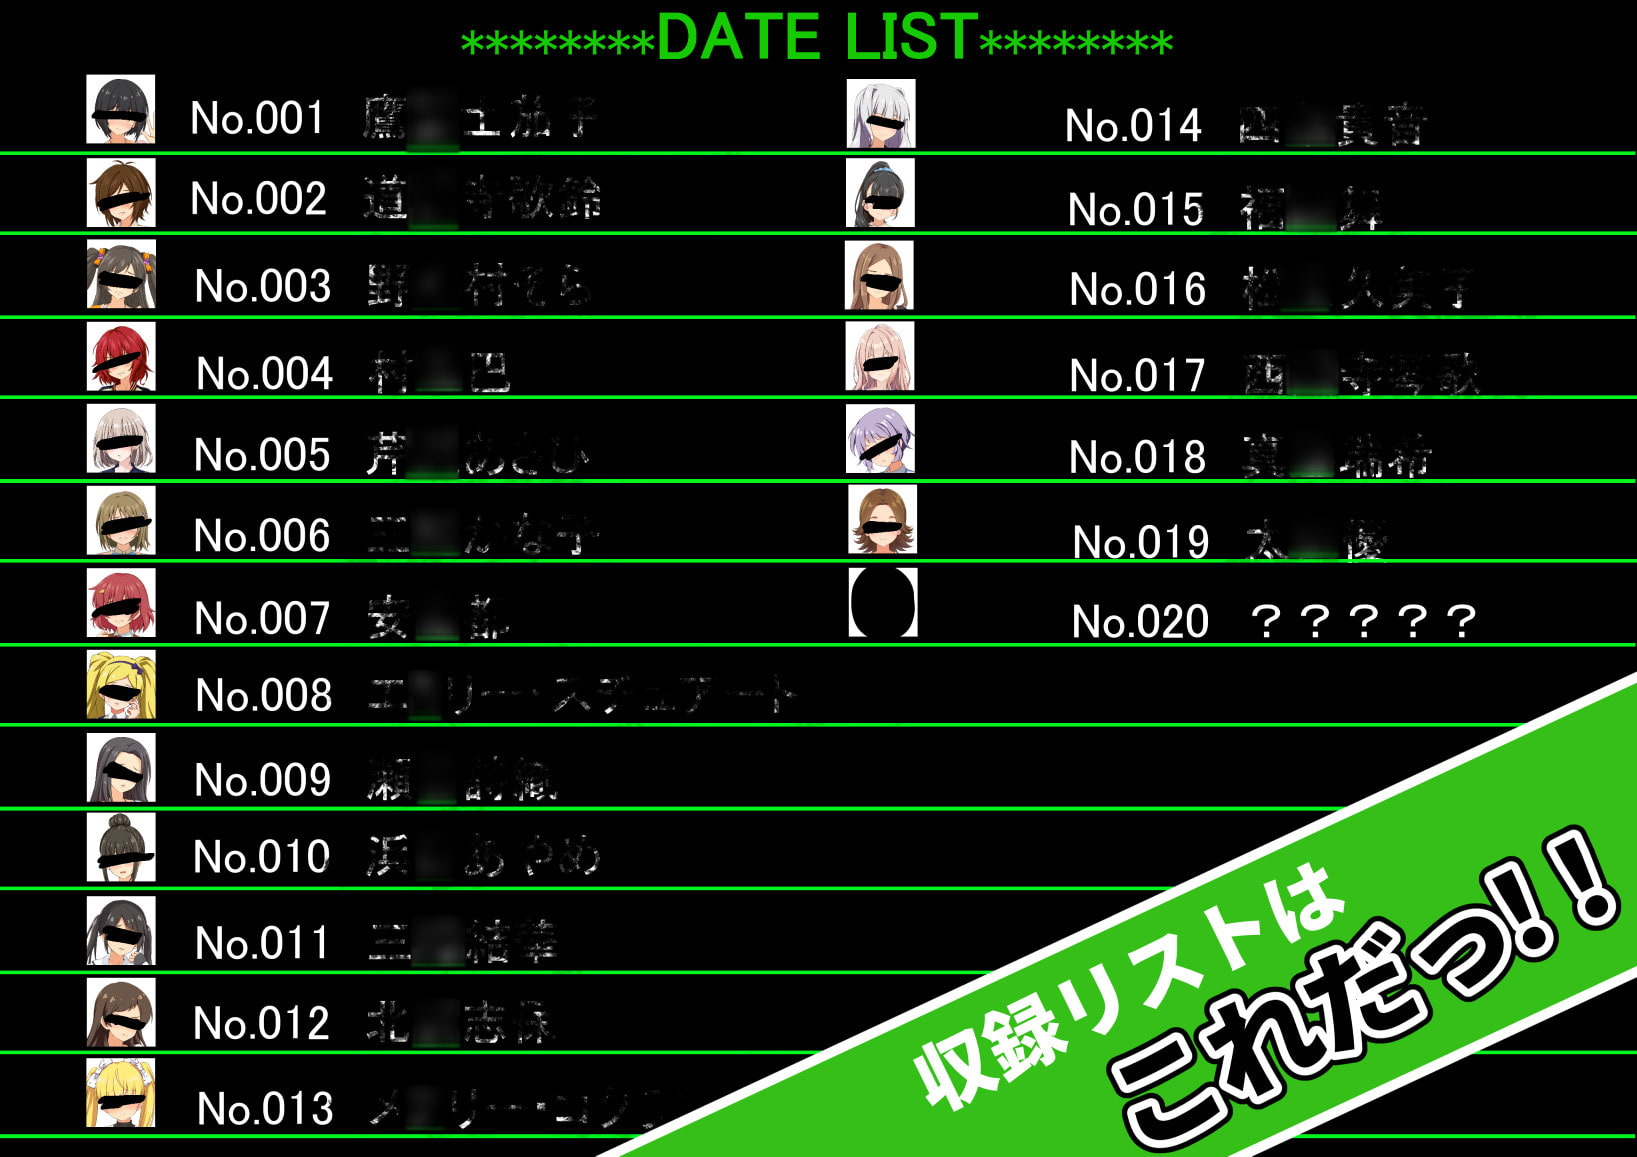 RJ315875 裏アイドル図鑑 vol.1 [20210218]